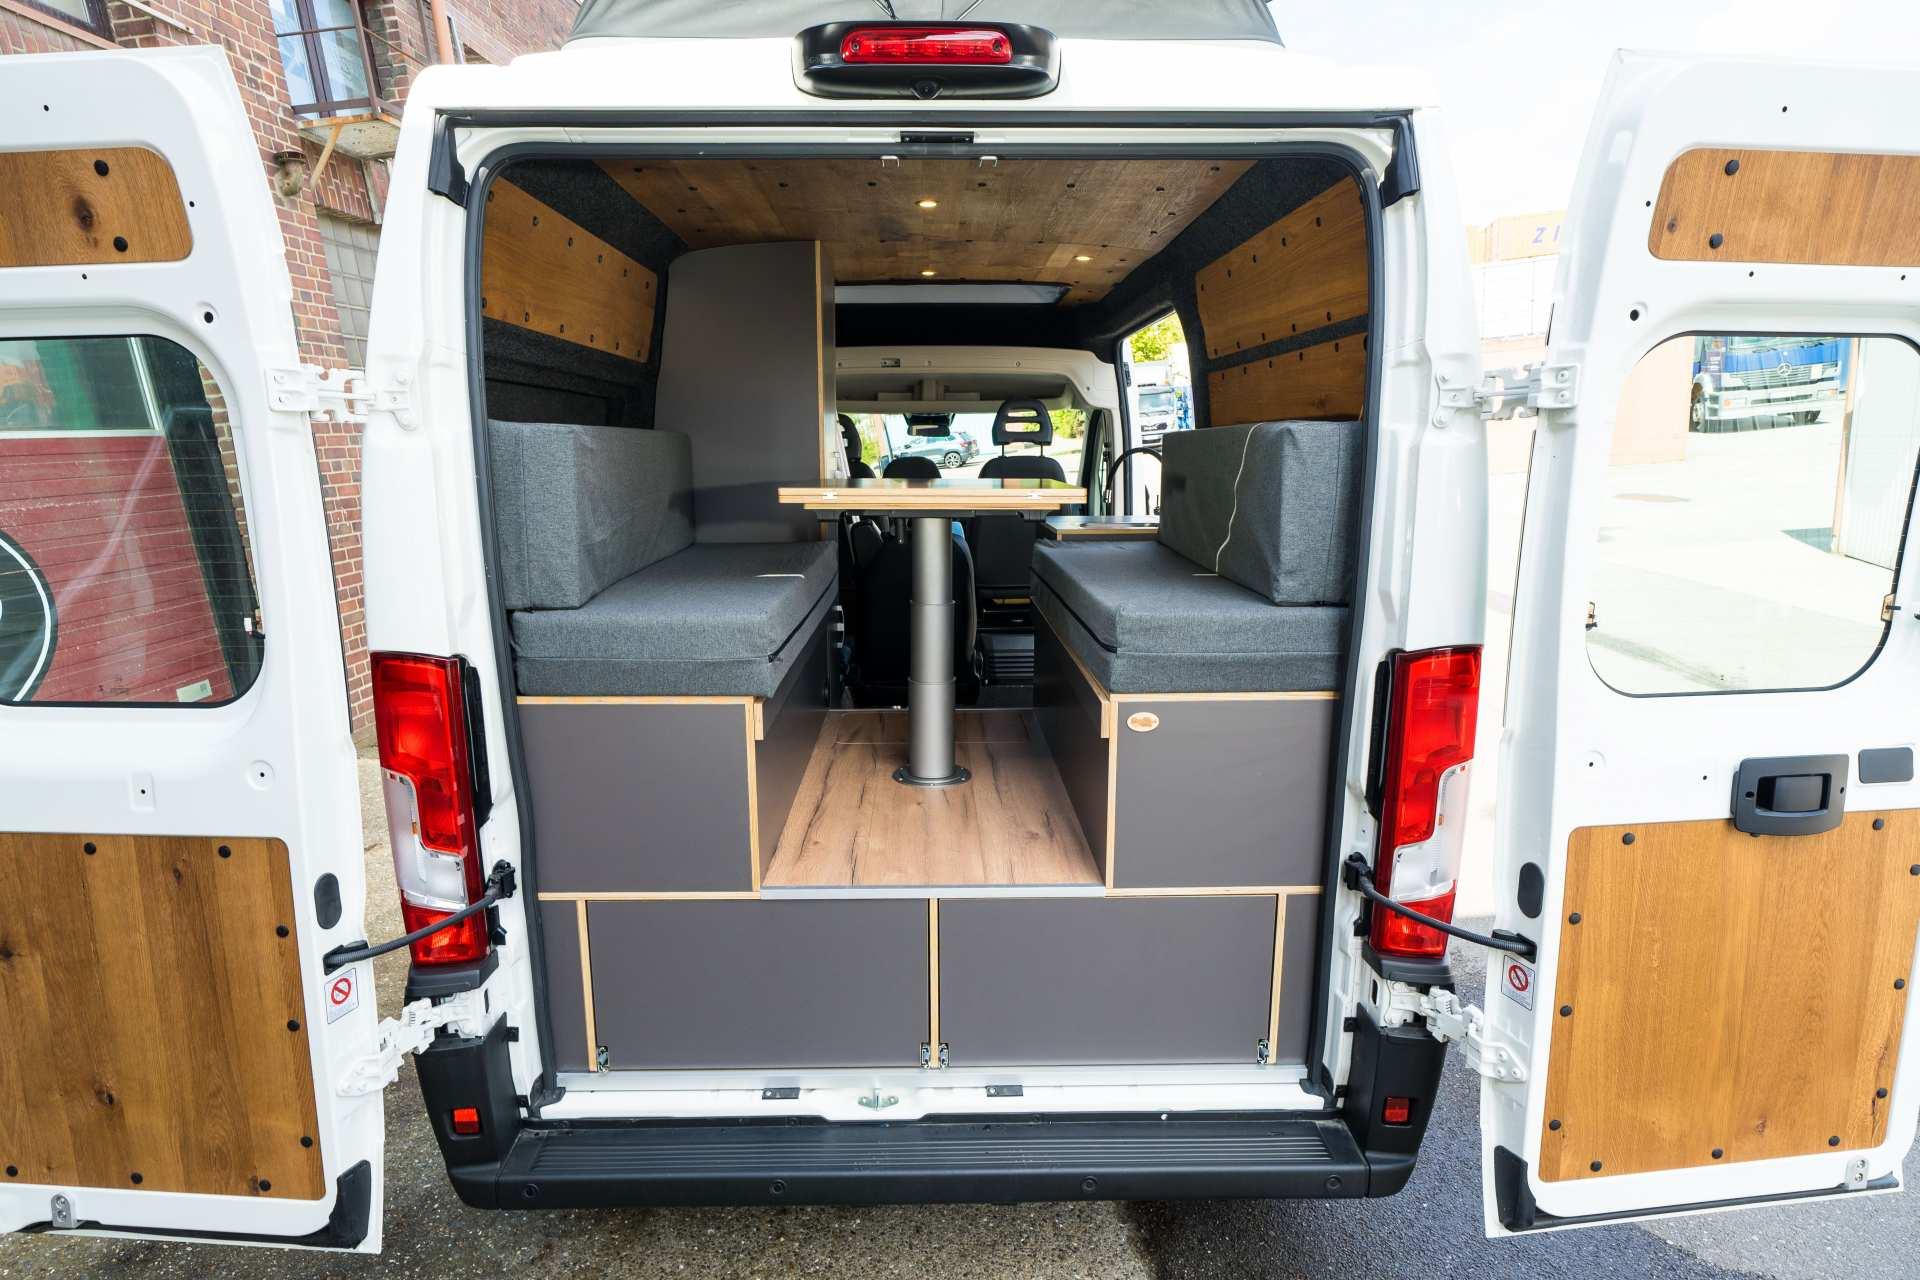 Individualausbau: Zwei-Raumwohnung Peugeot Boxer L2 H2 - 7